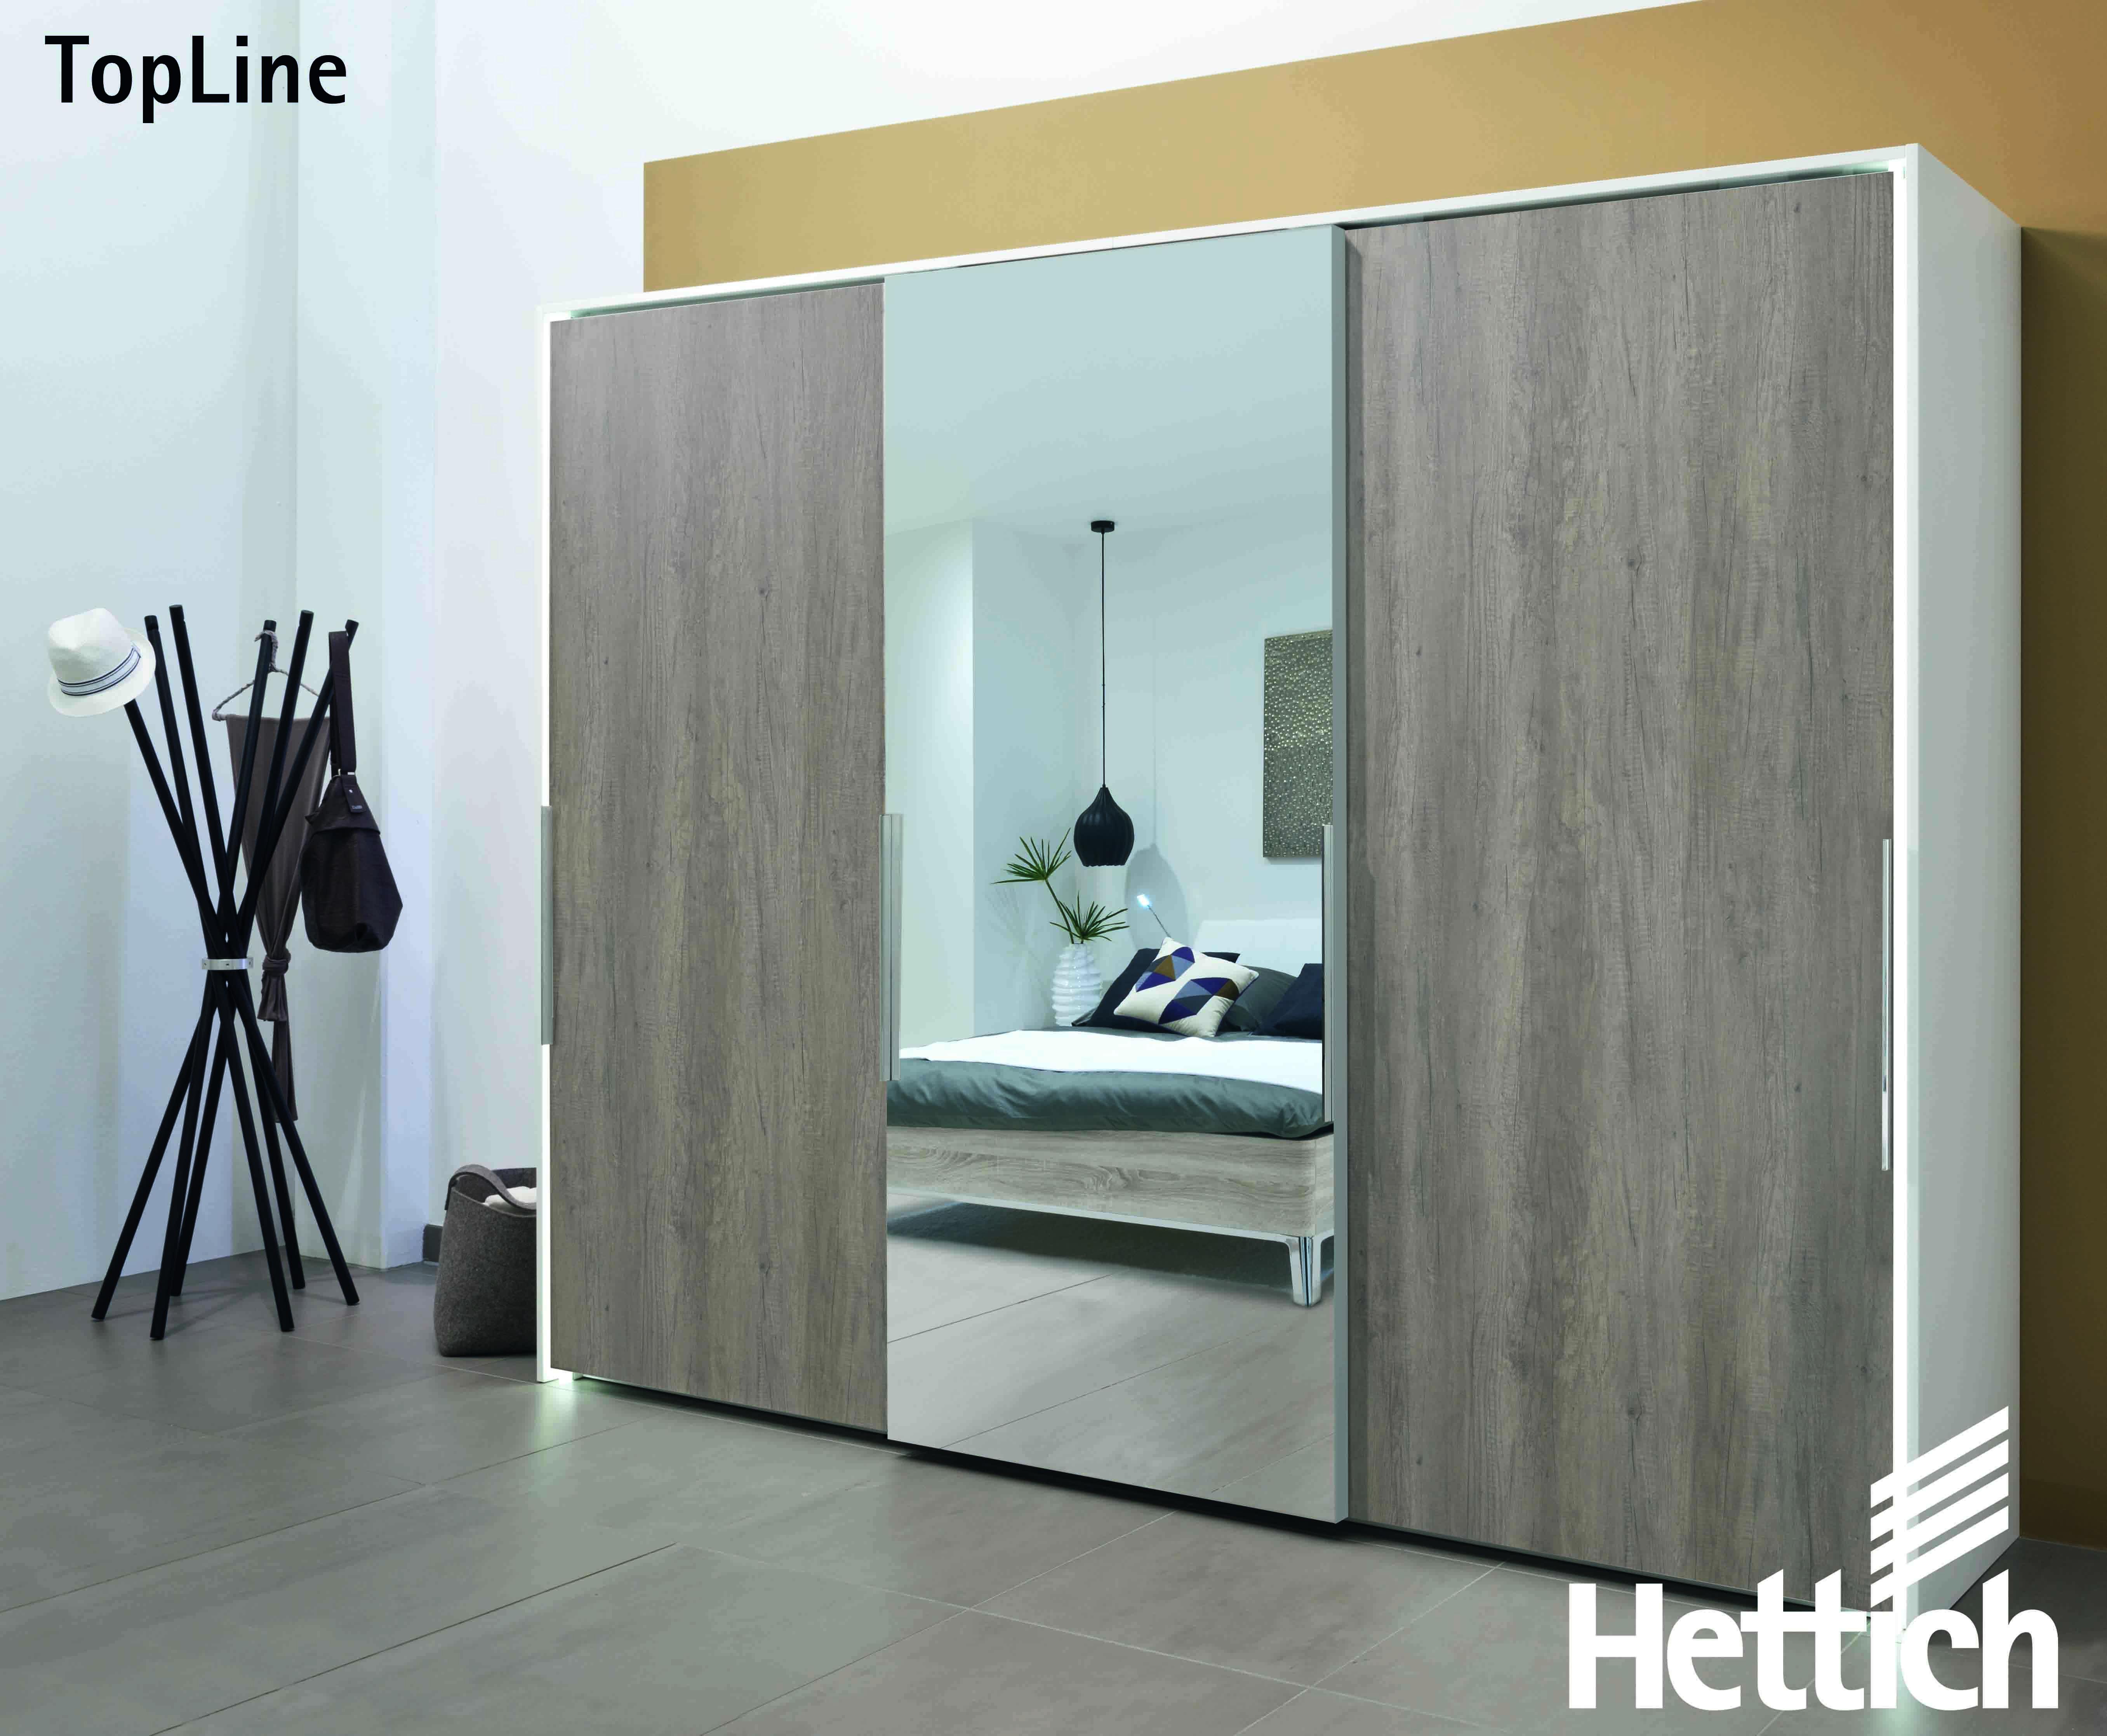 Exterior: The TopLine Sliding Door System Range From Hettich Can